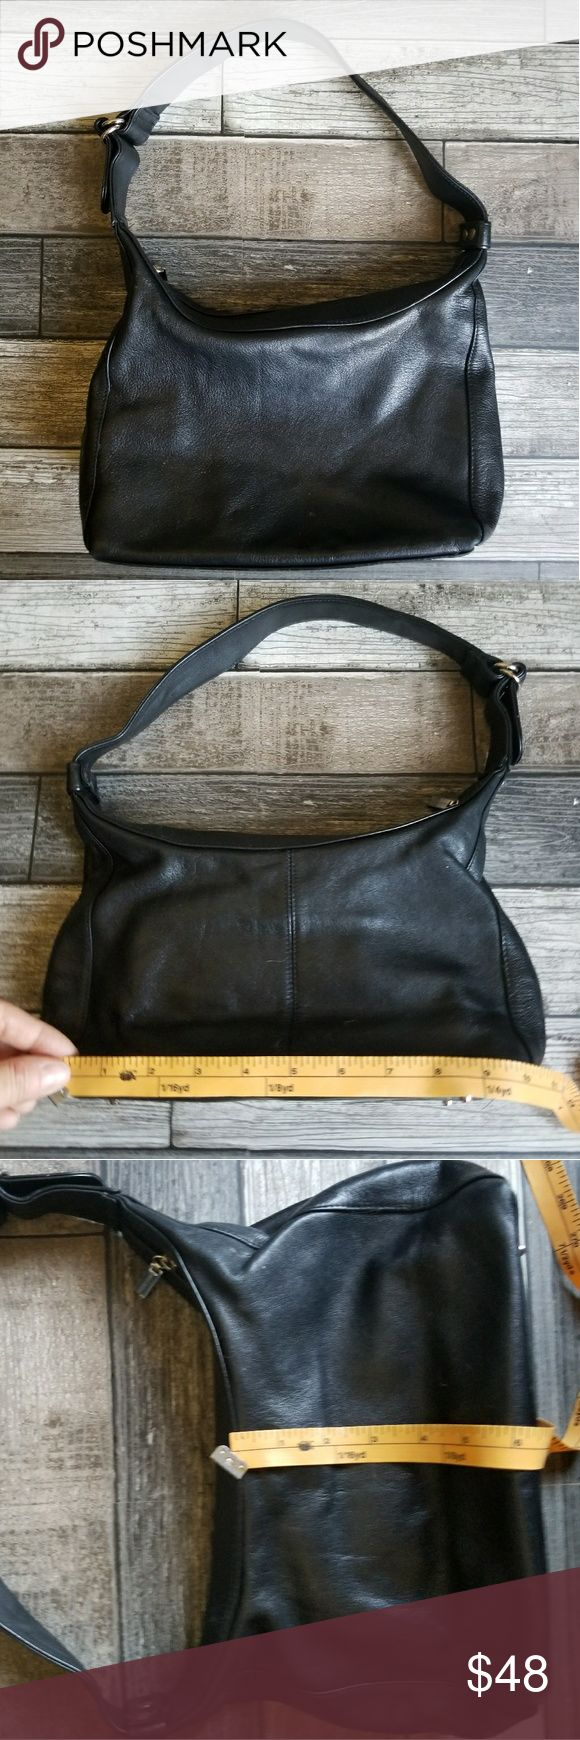 PELLE STUDIO (WILSON'S) black leather bag Black leather